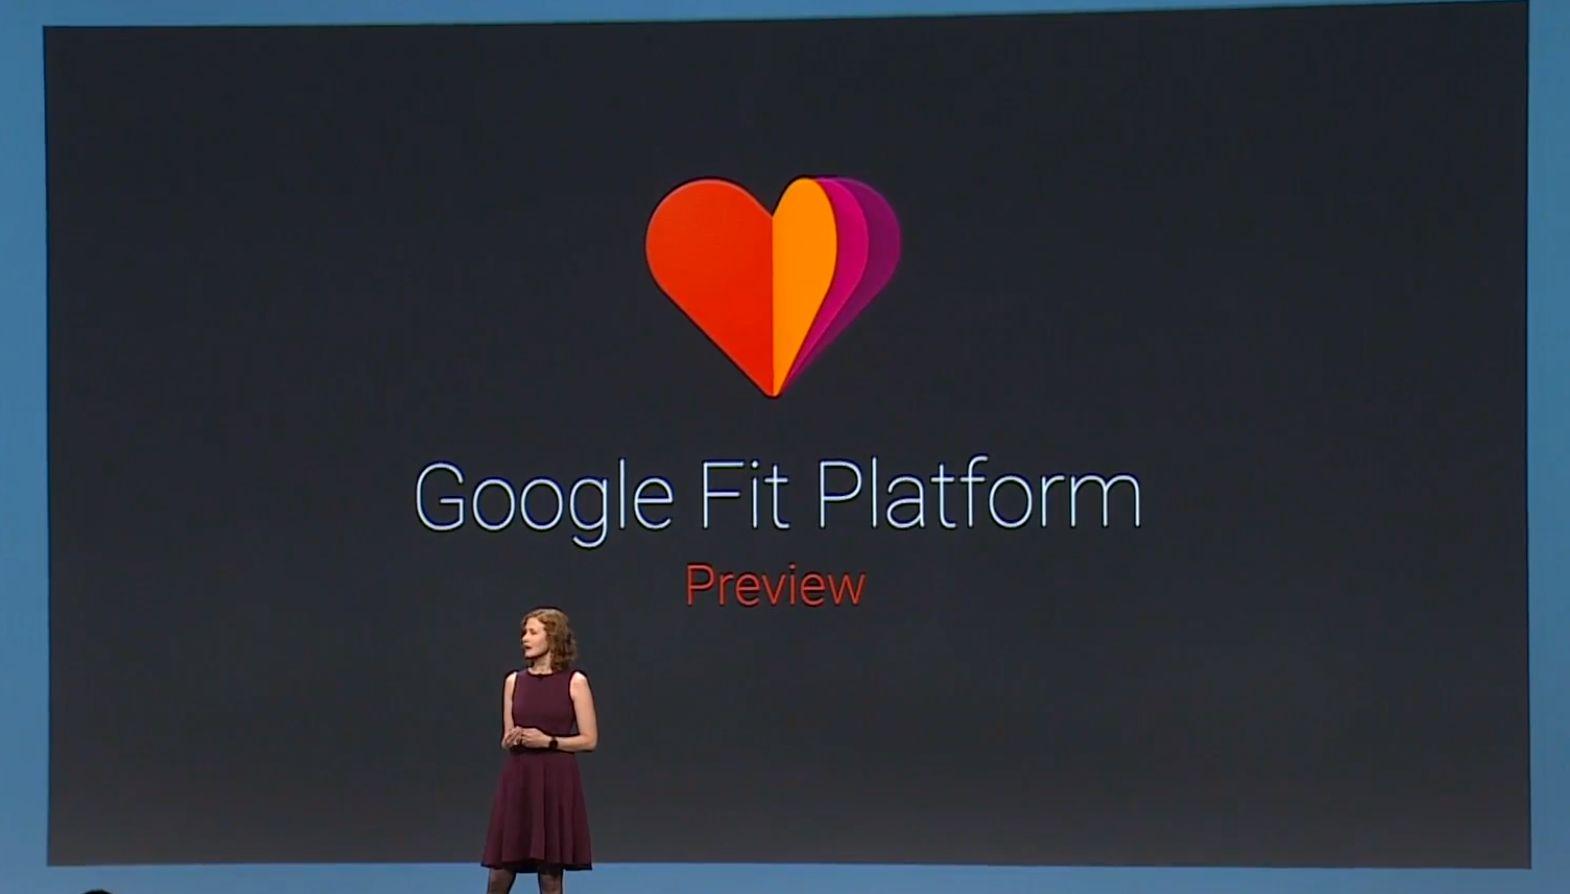 La piattaforma Google Fit